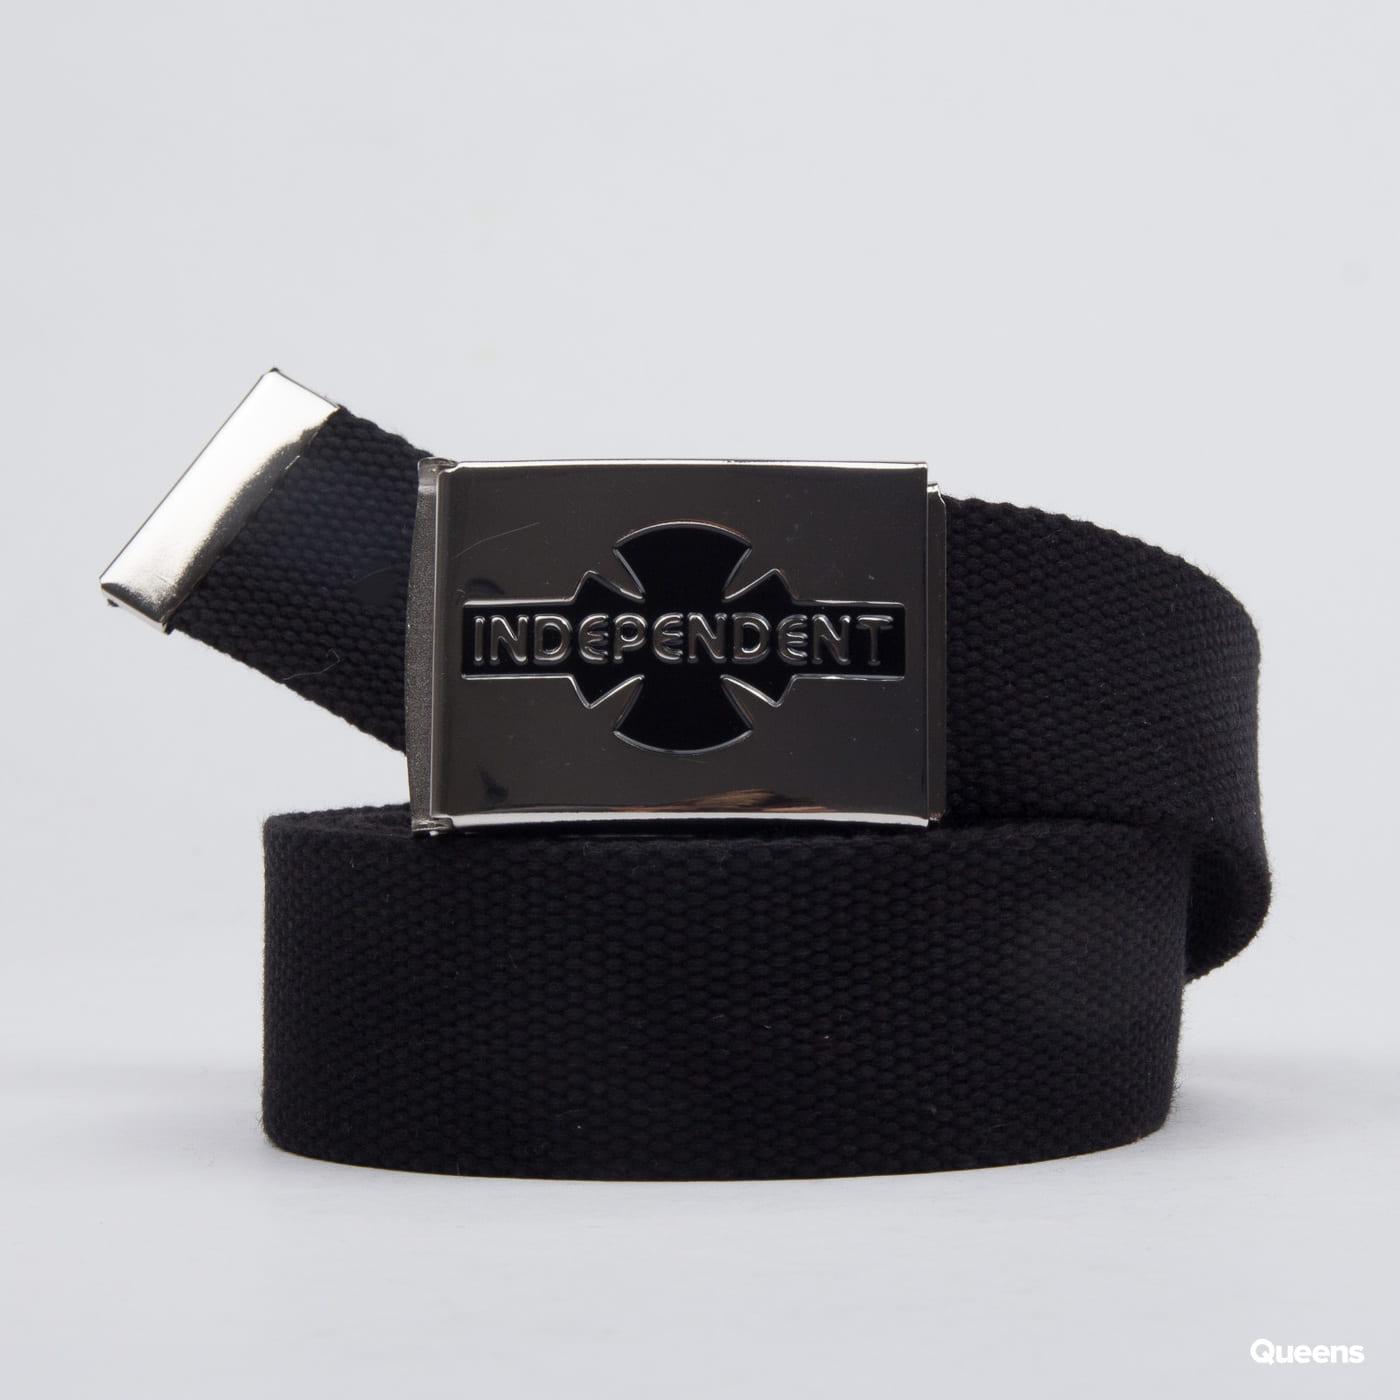 INDEPENDENT Clipped Belt schwarz